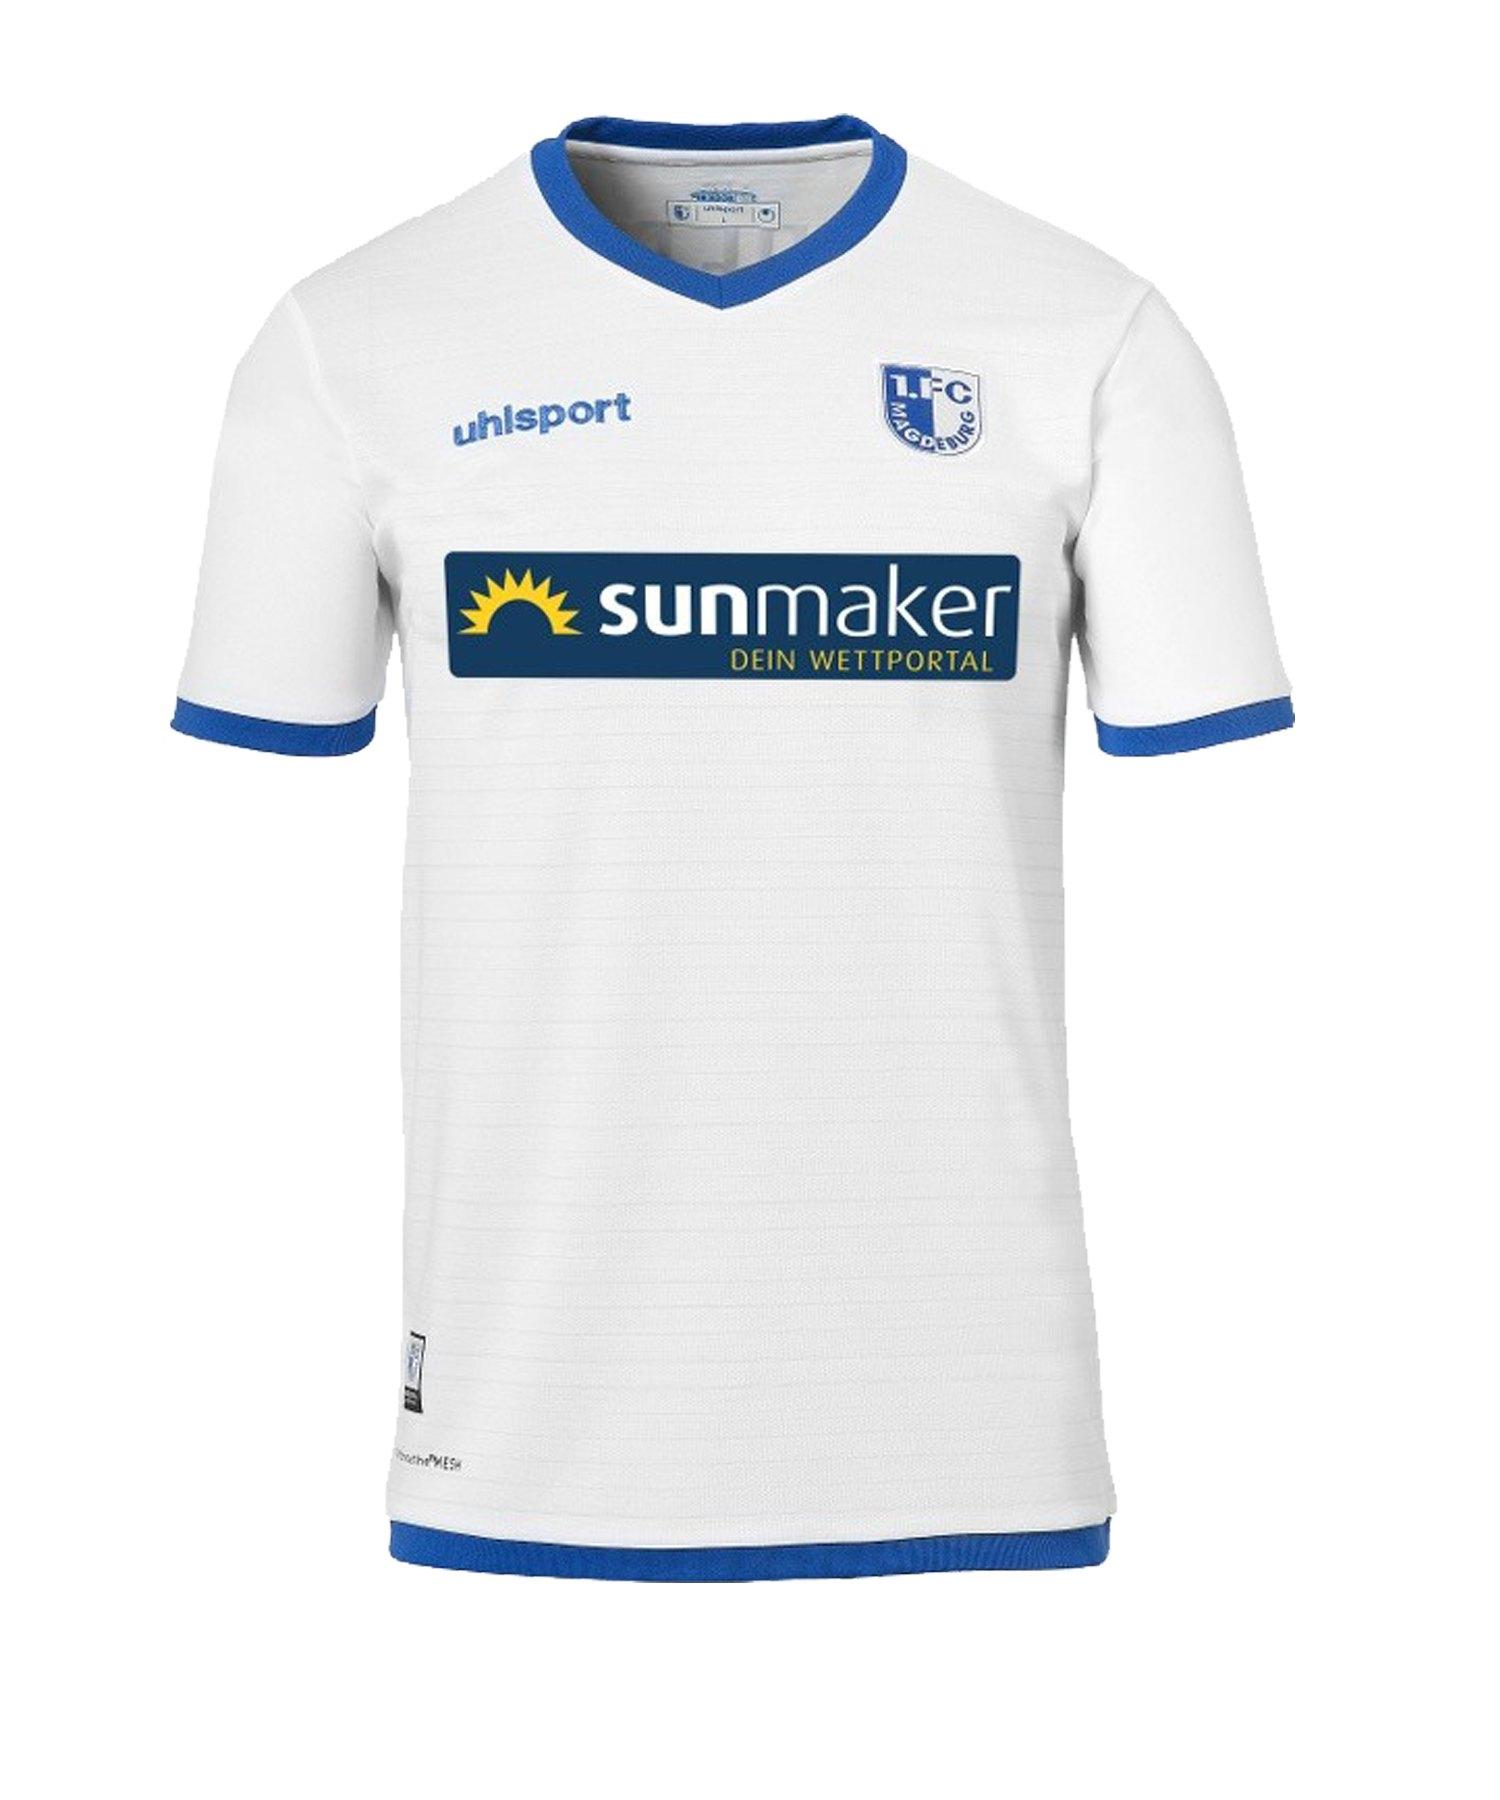 Uhlsport 1. FC Magdeburg Trikot Away 2019/2020 - weiss